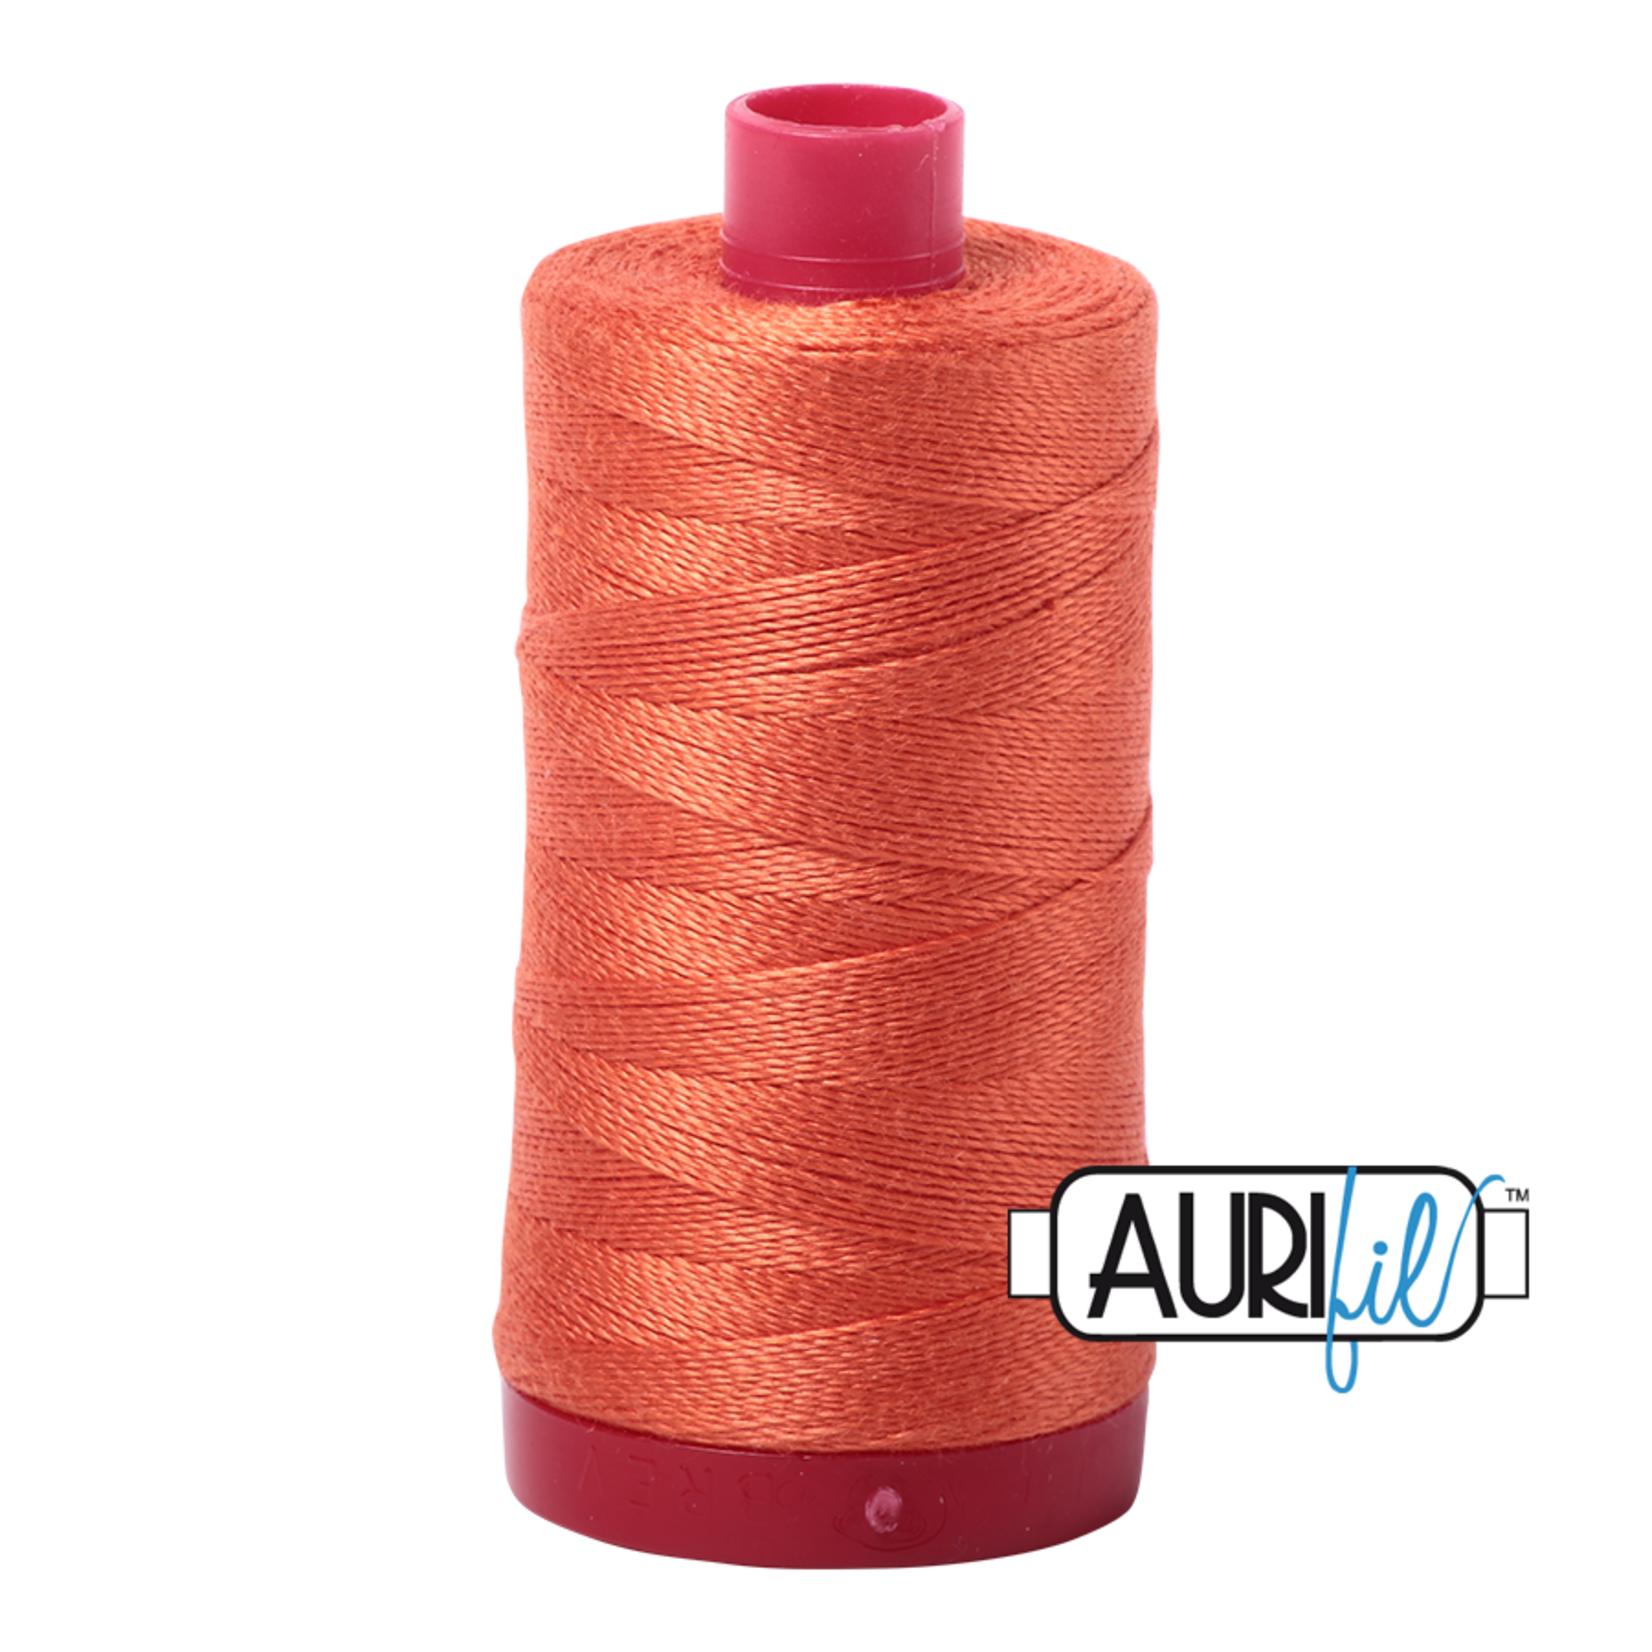 AURIFIL AURIFIL 12 WT Dusty Orange 1154